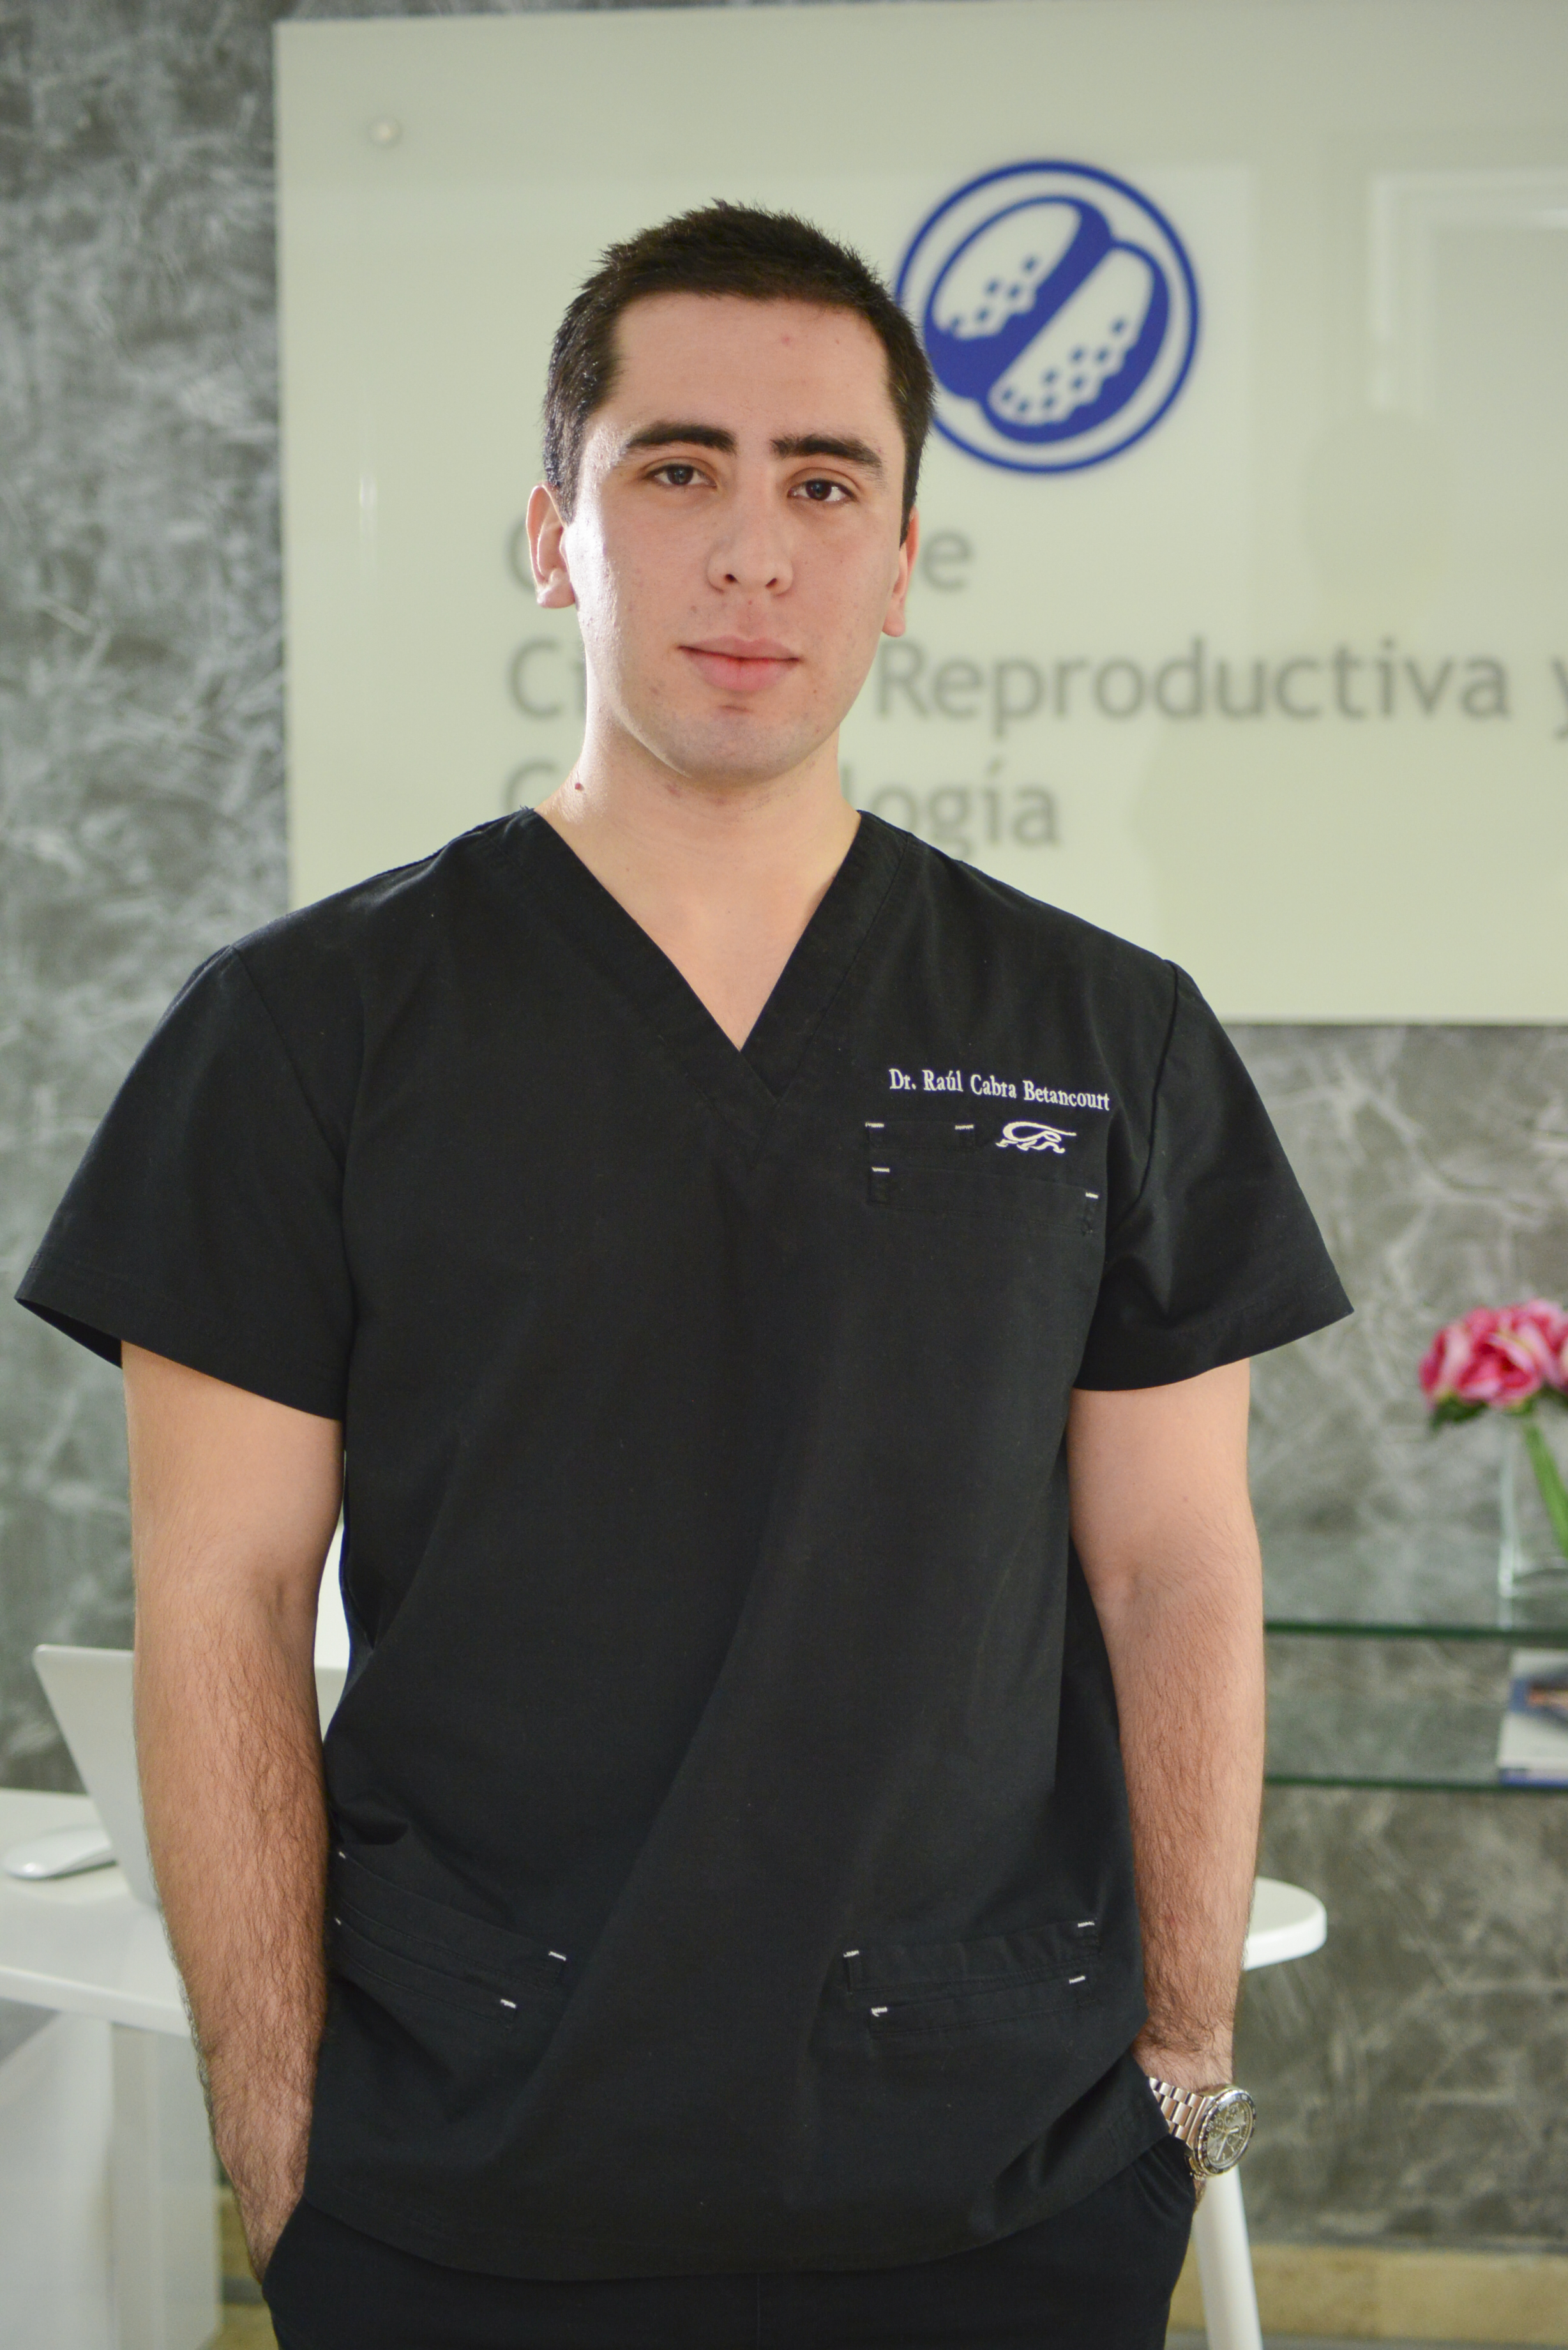 Dr. José Raúl Cabra Betancourt